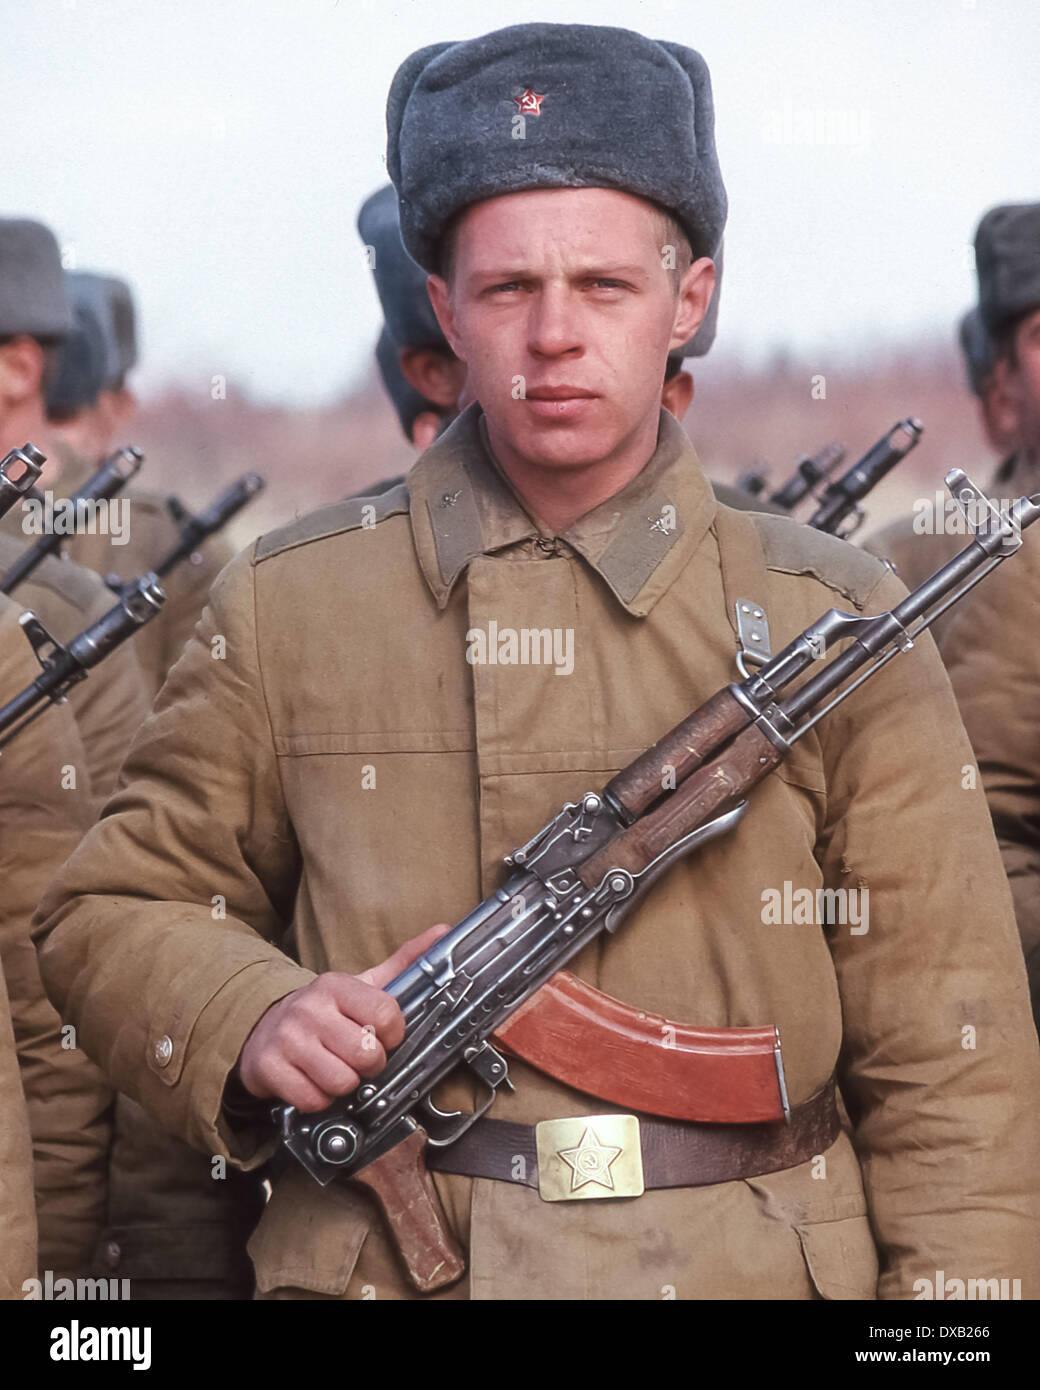 Soviet Afghanistan war - Page 6 Feb-16-1989-termez-uzbekistan-ru-armed-with-an-ak-47-kalashnikov-rifle-DXB266